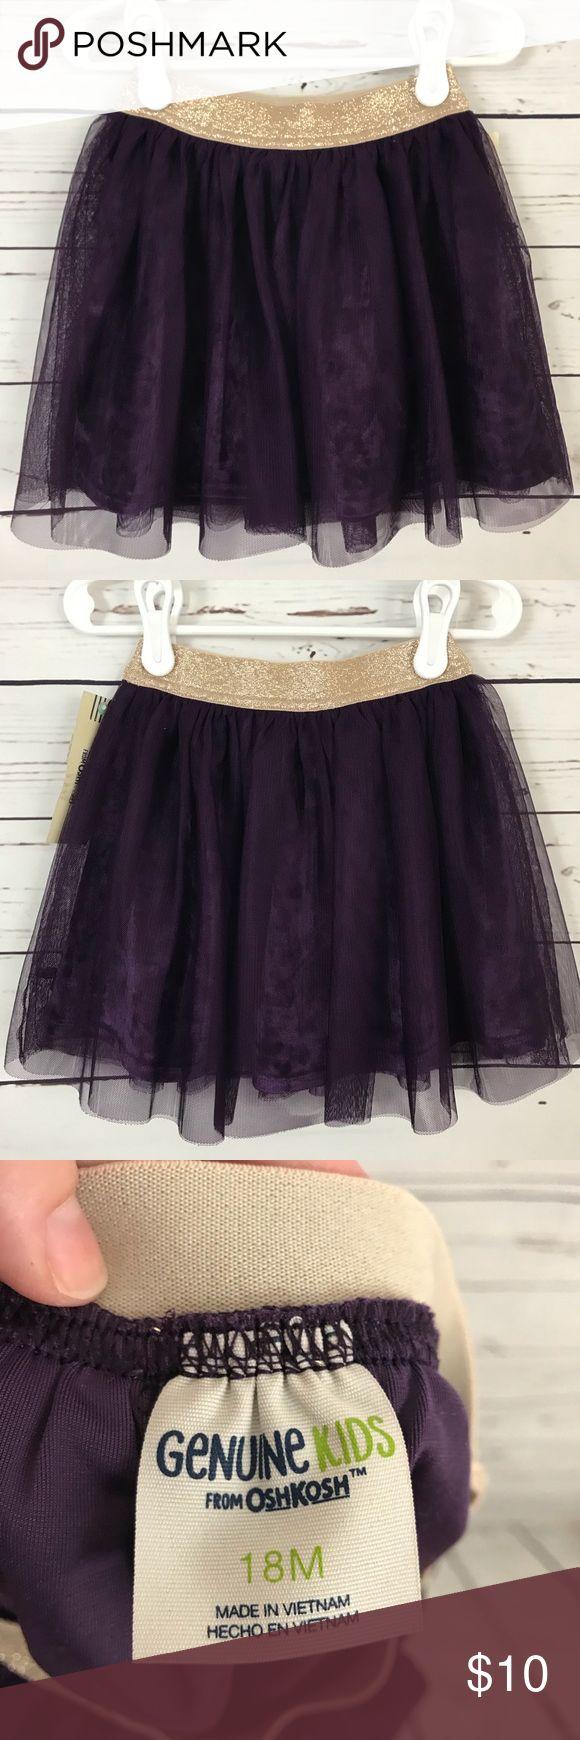 OshKosh Girls Skirt Girls tulle and velvet skirt in a rich purple currant color. Machine wash, tumble dry. Brand new!! Osh Kosh Bottoms Skirts